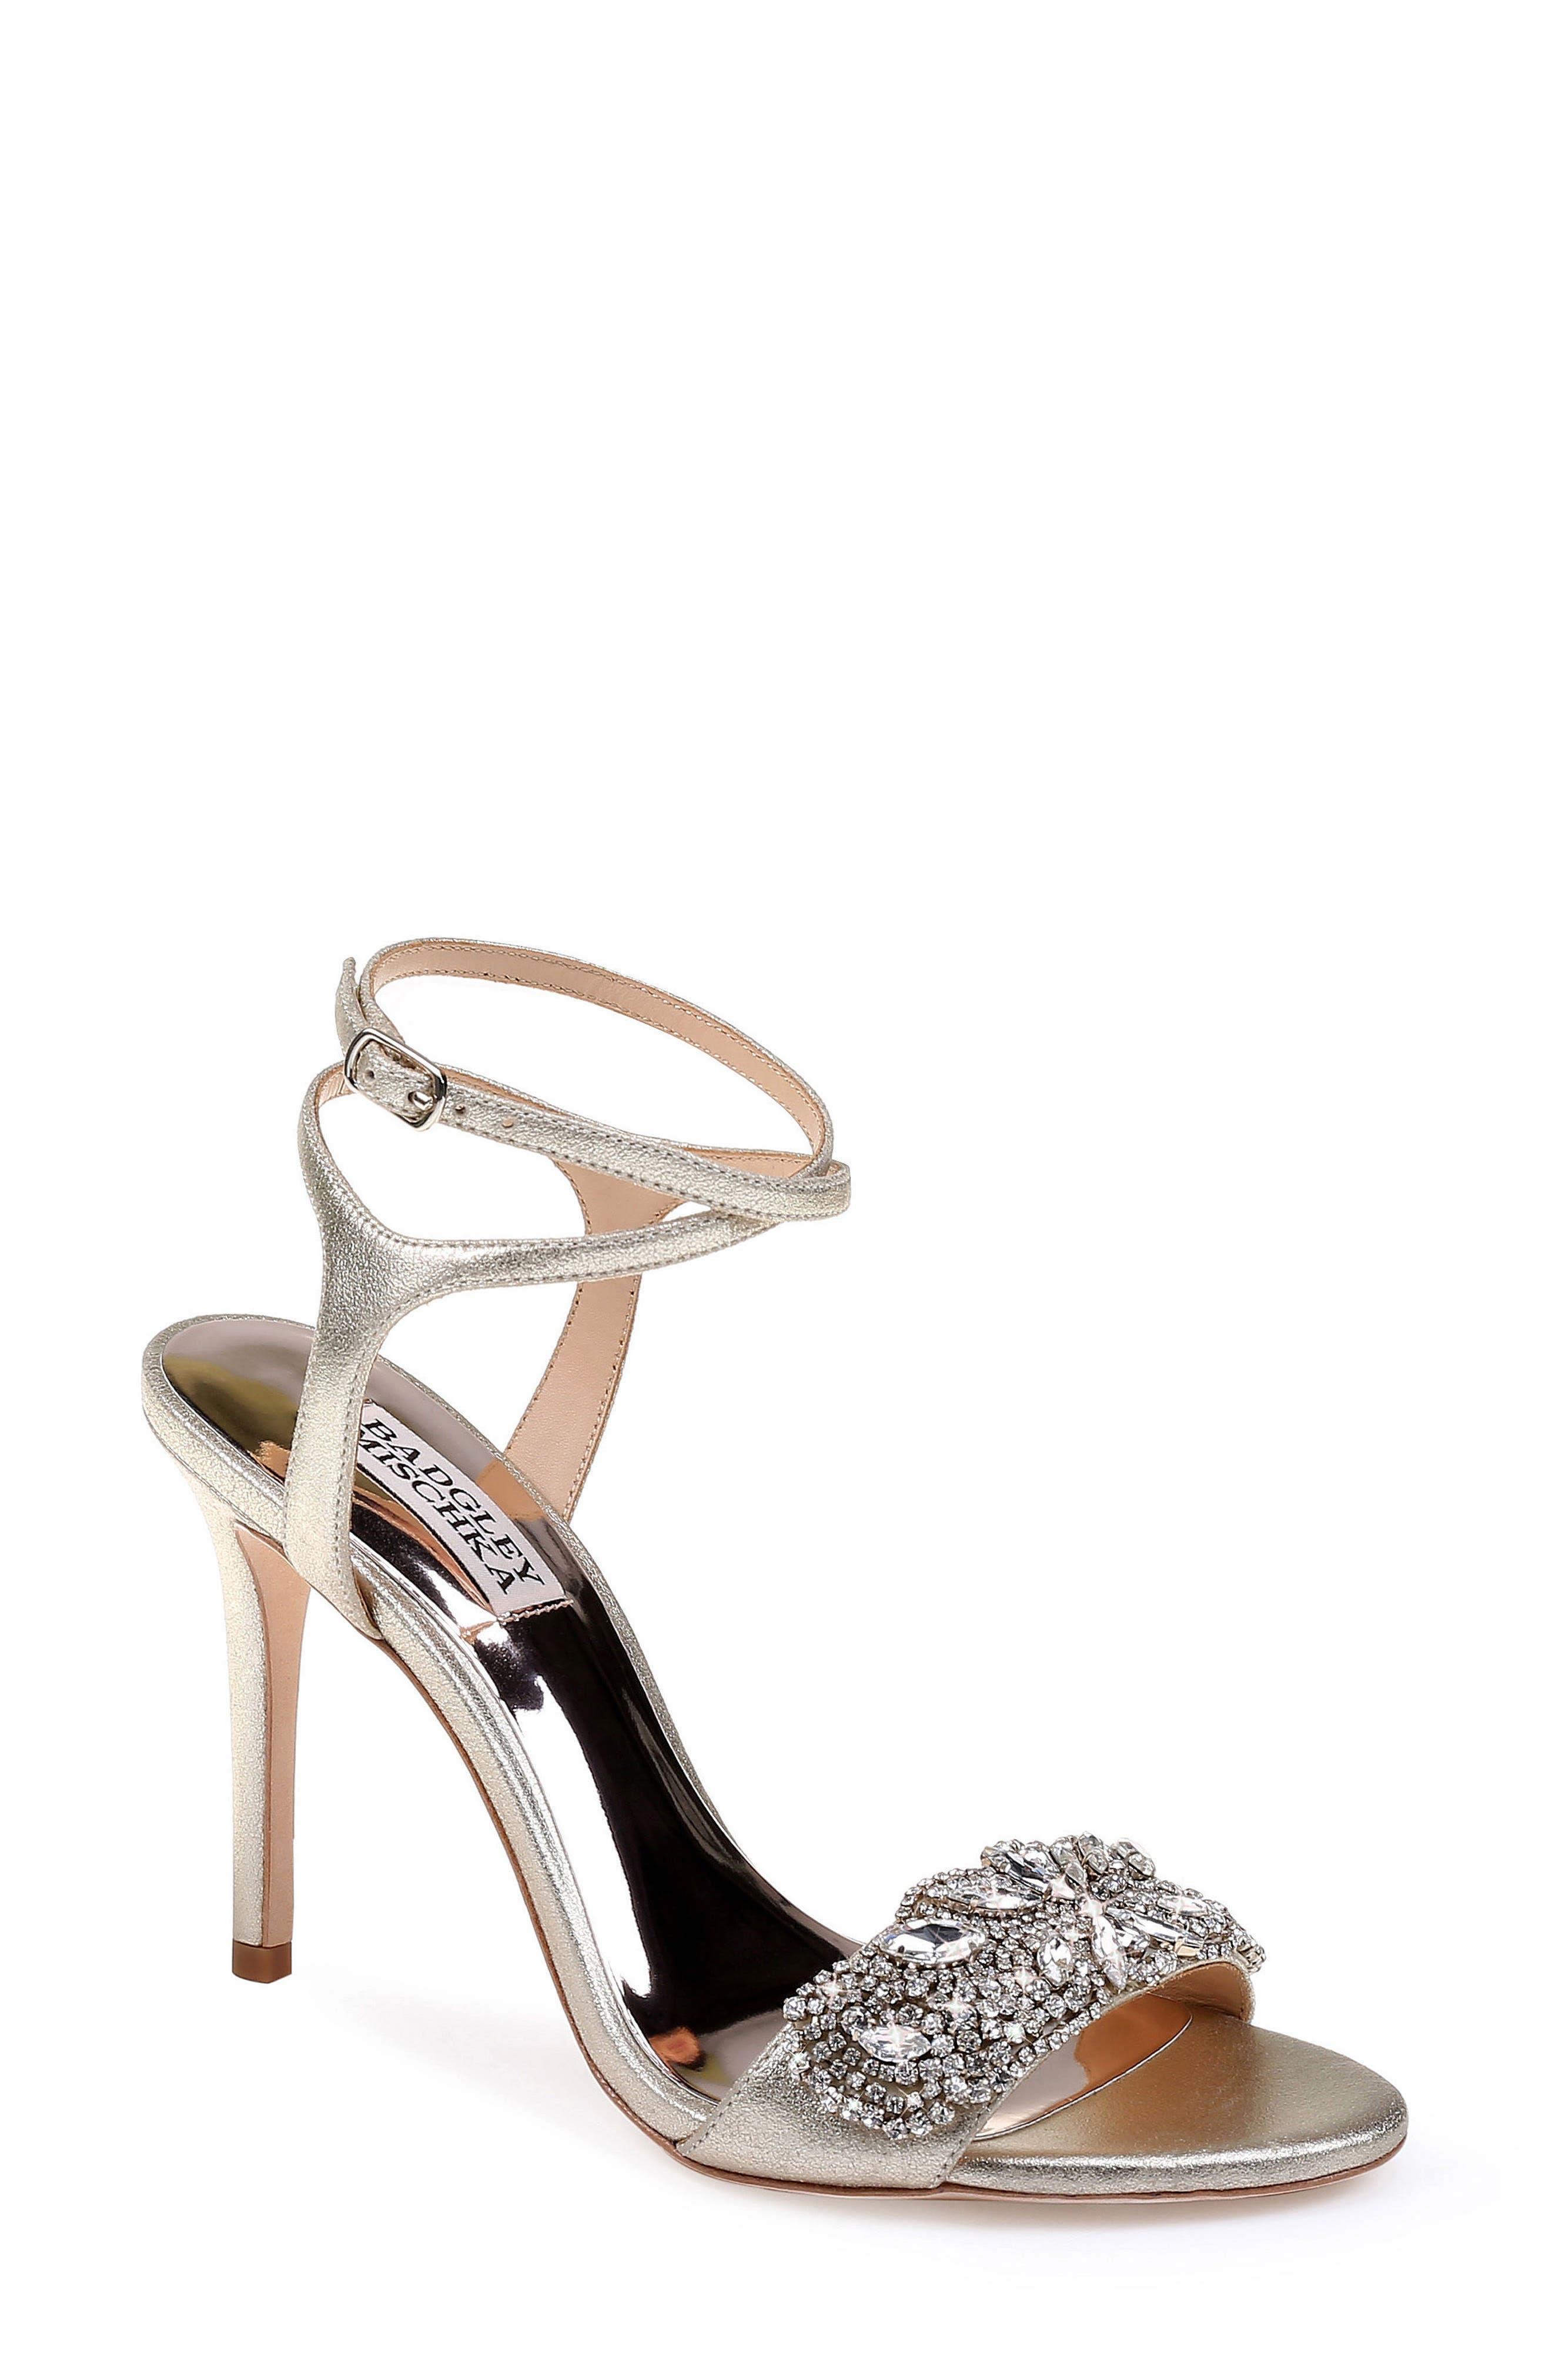 Badgley Mischka Hailey Embellished Ankle Strap Sandal- Metallic